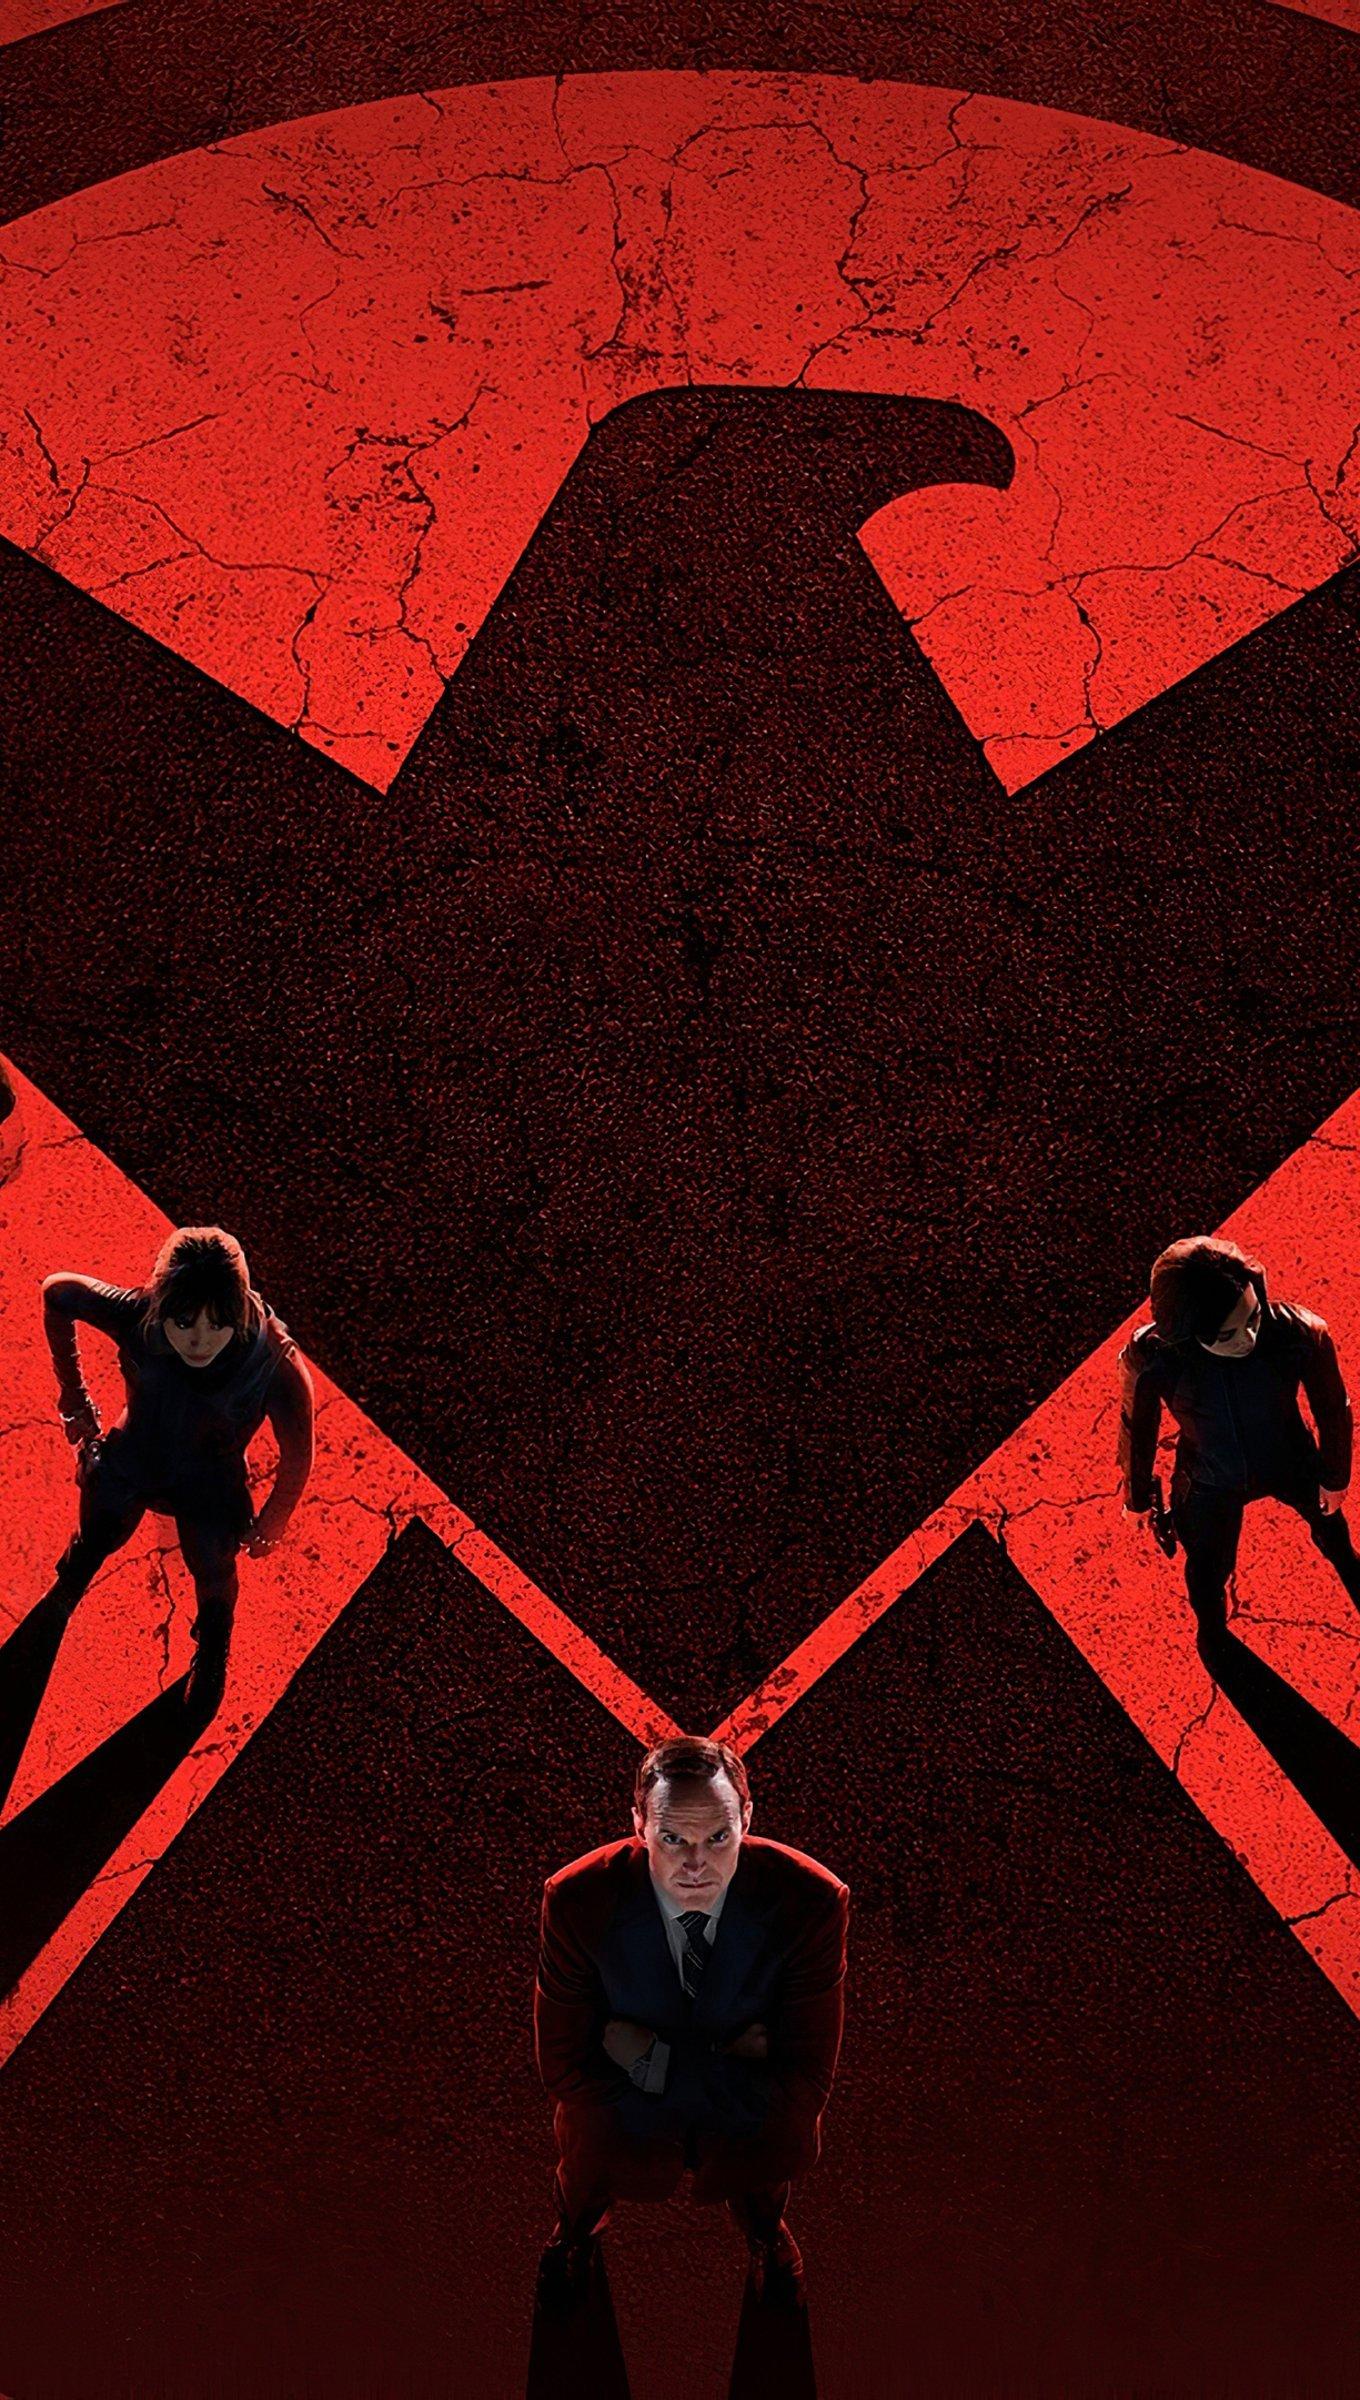 Fondos de pantalla Agents of Shield Temporada 7 Vertical